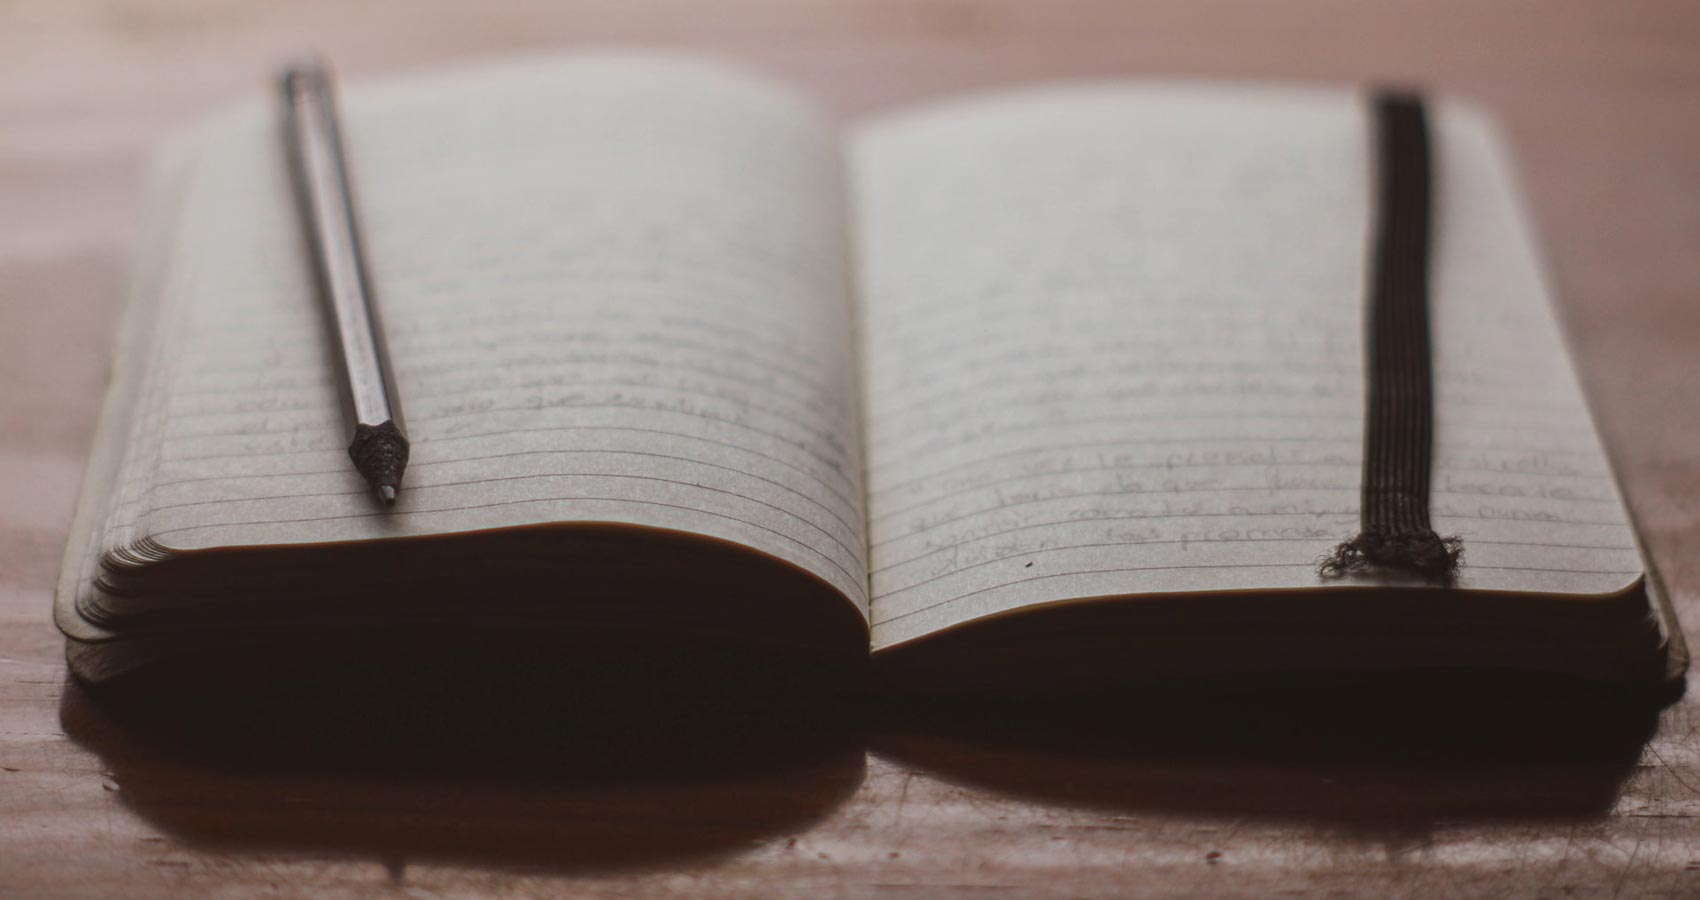 The Writer, a short story by Nikhil Kshirsagar at Spillwords.com